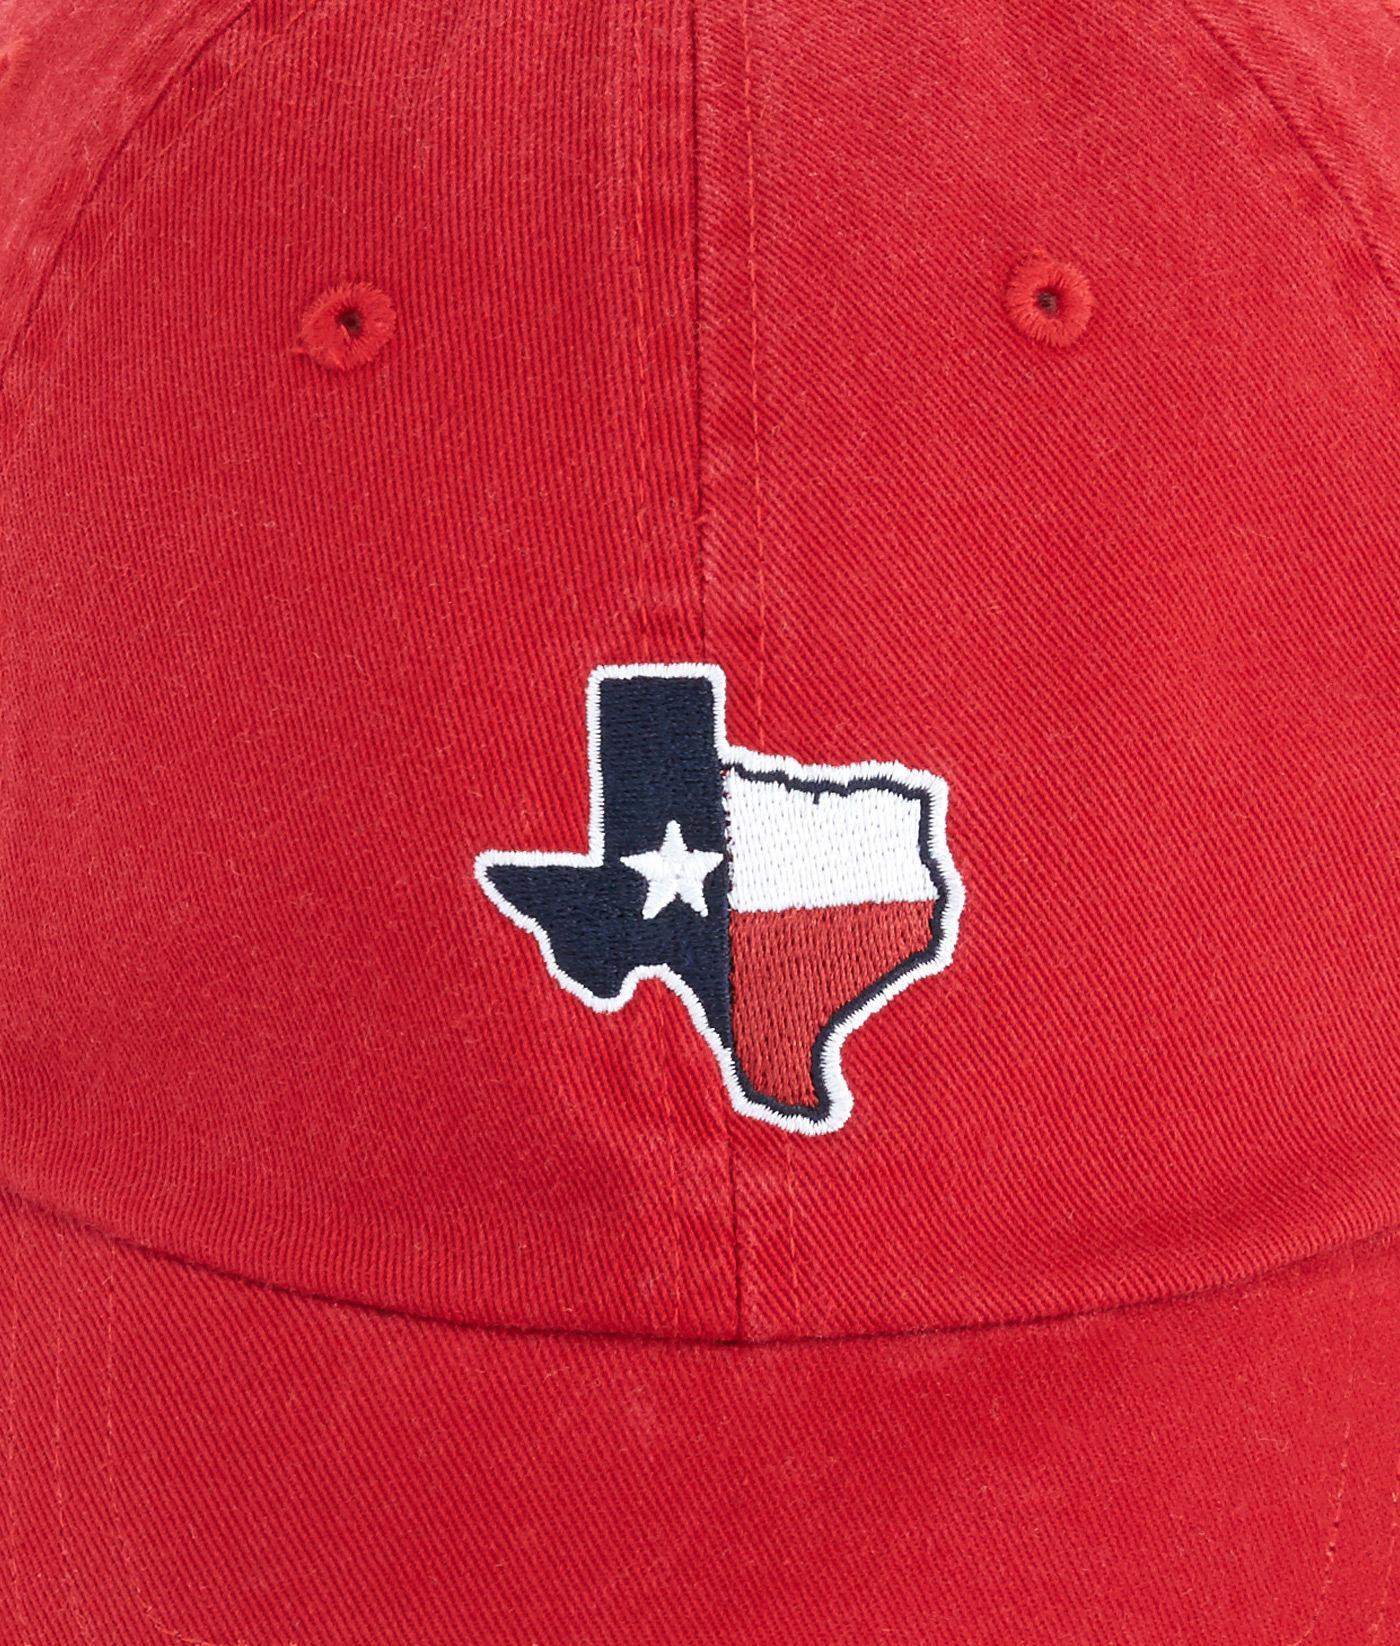 30bf357f4589e ... buy lyst vineyard vines texas state flag whale baseball hat in red for  men cf9ec 91528